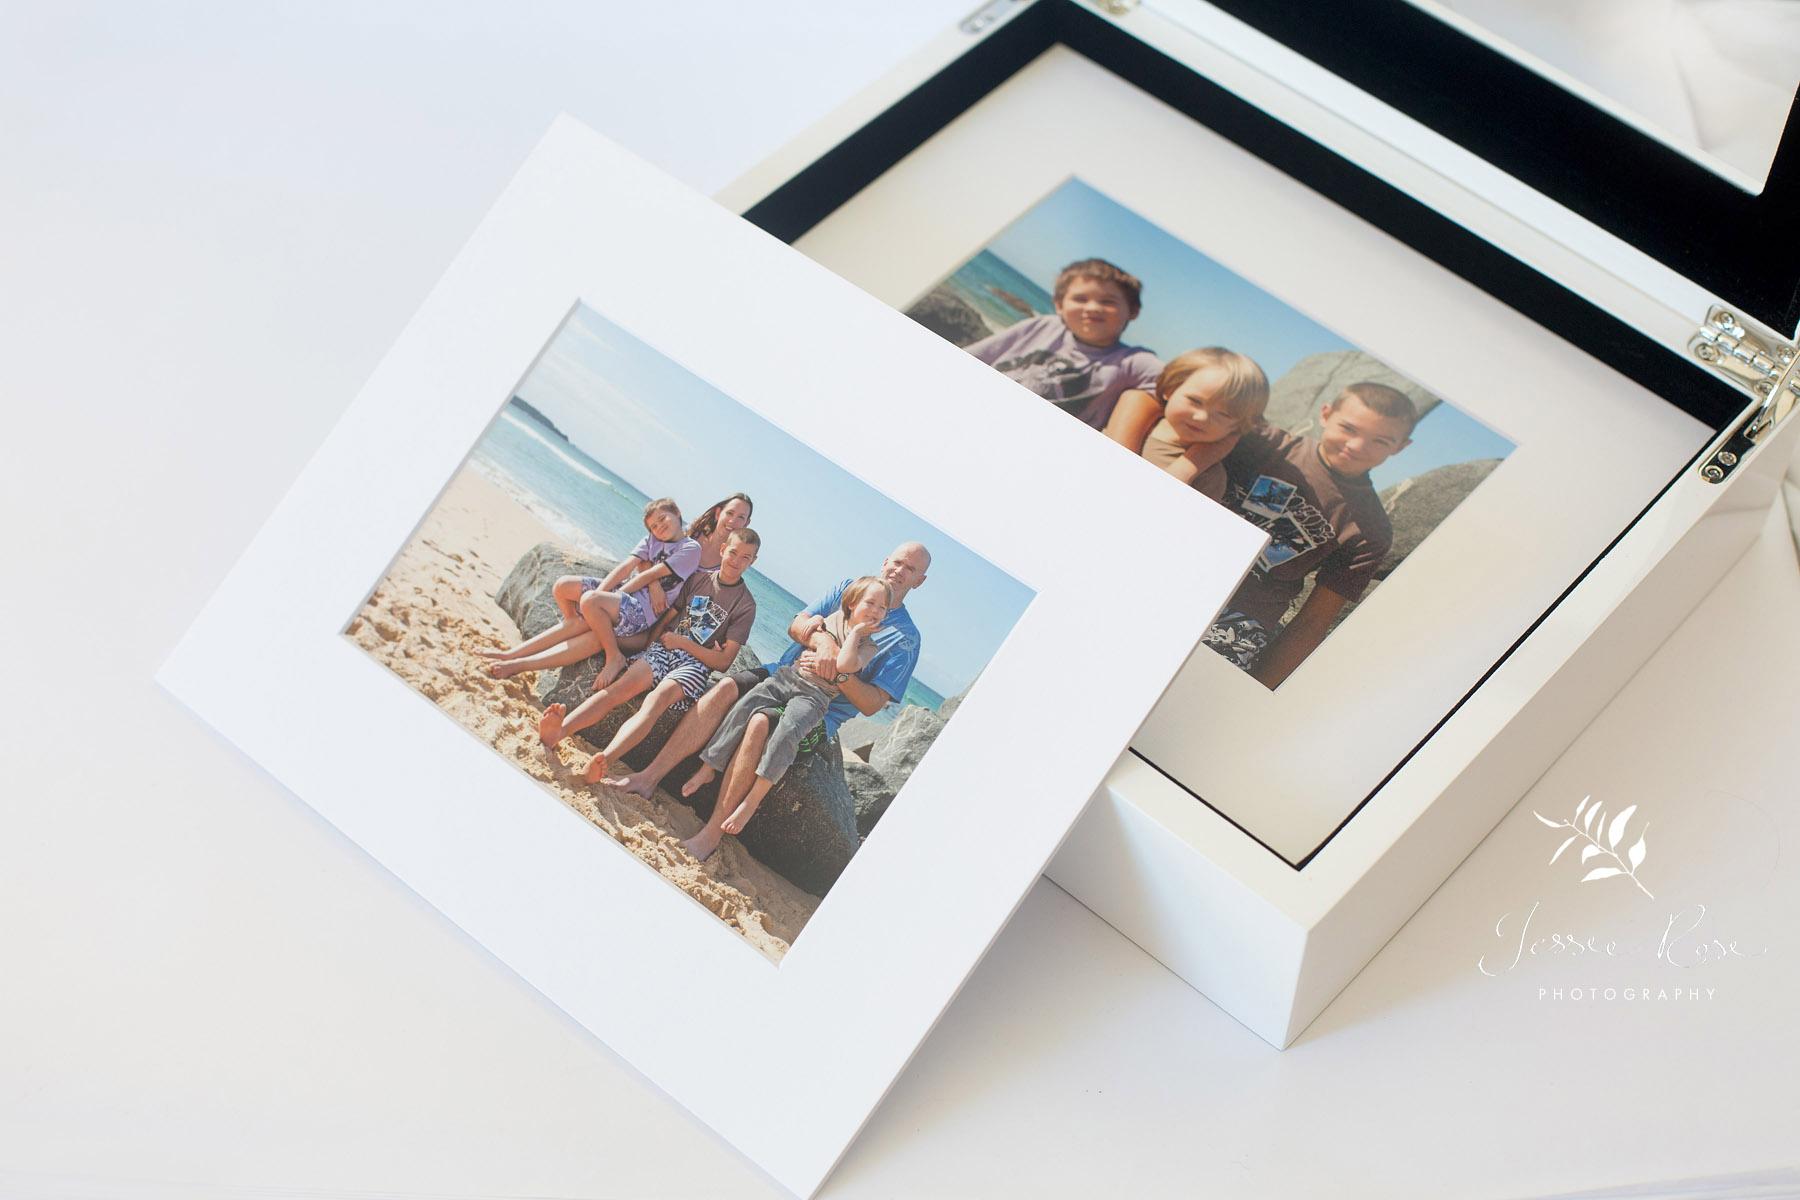 portrait-matted-print-box